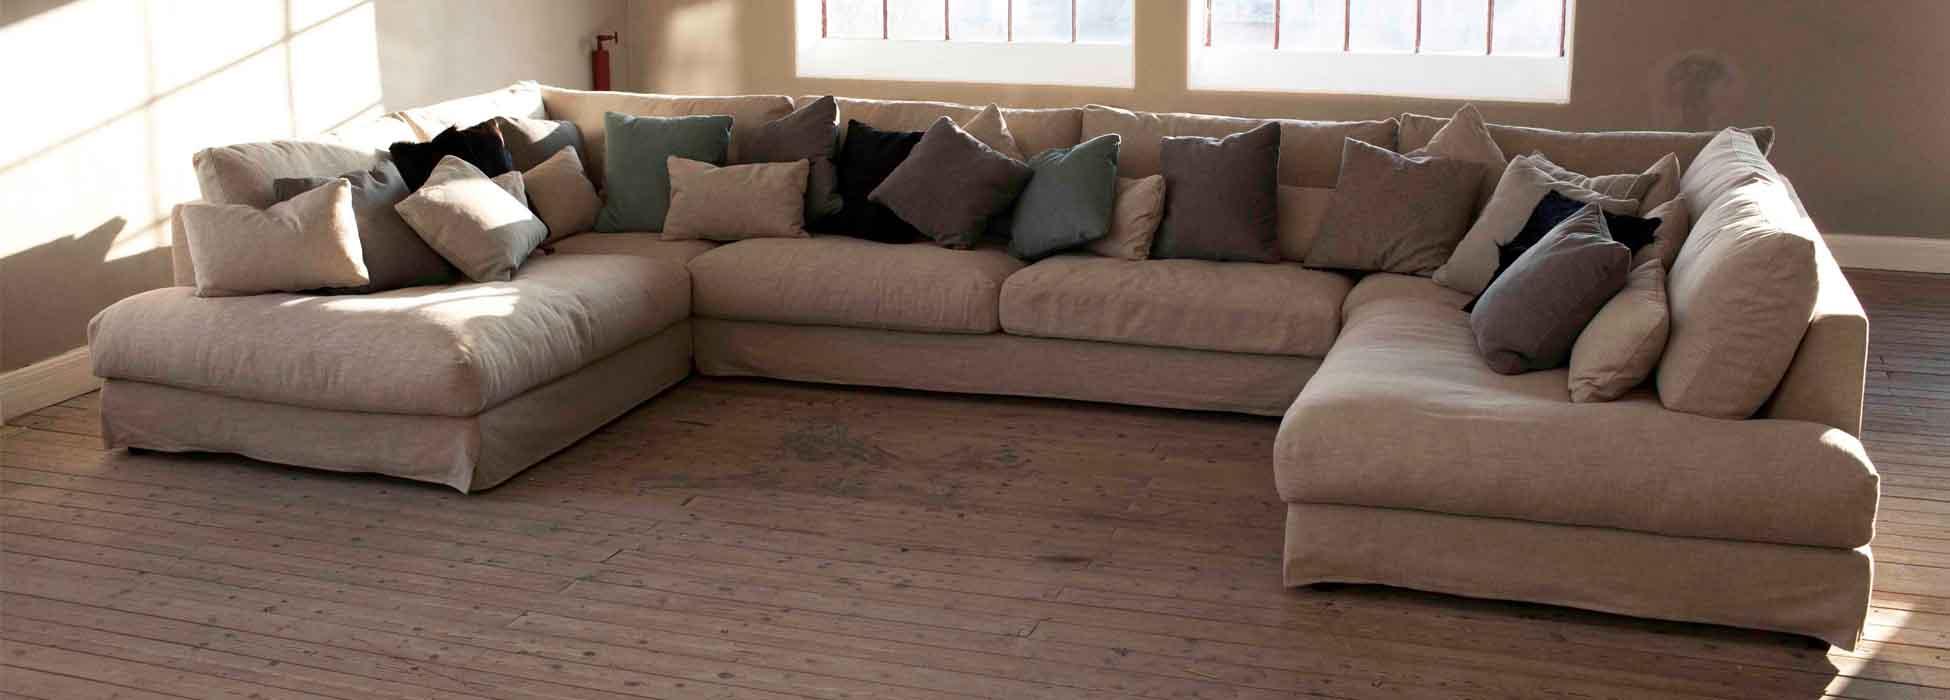 Sofa suites corner suites CVVBCDR